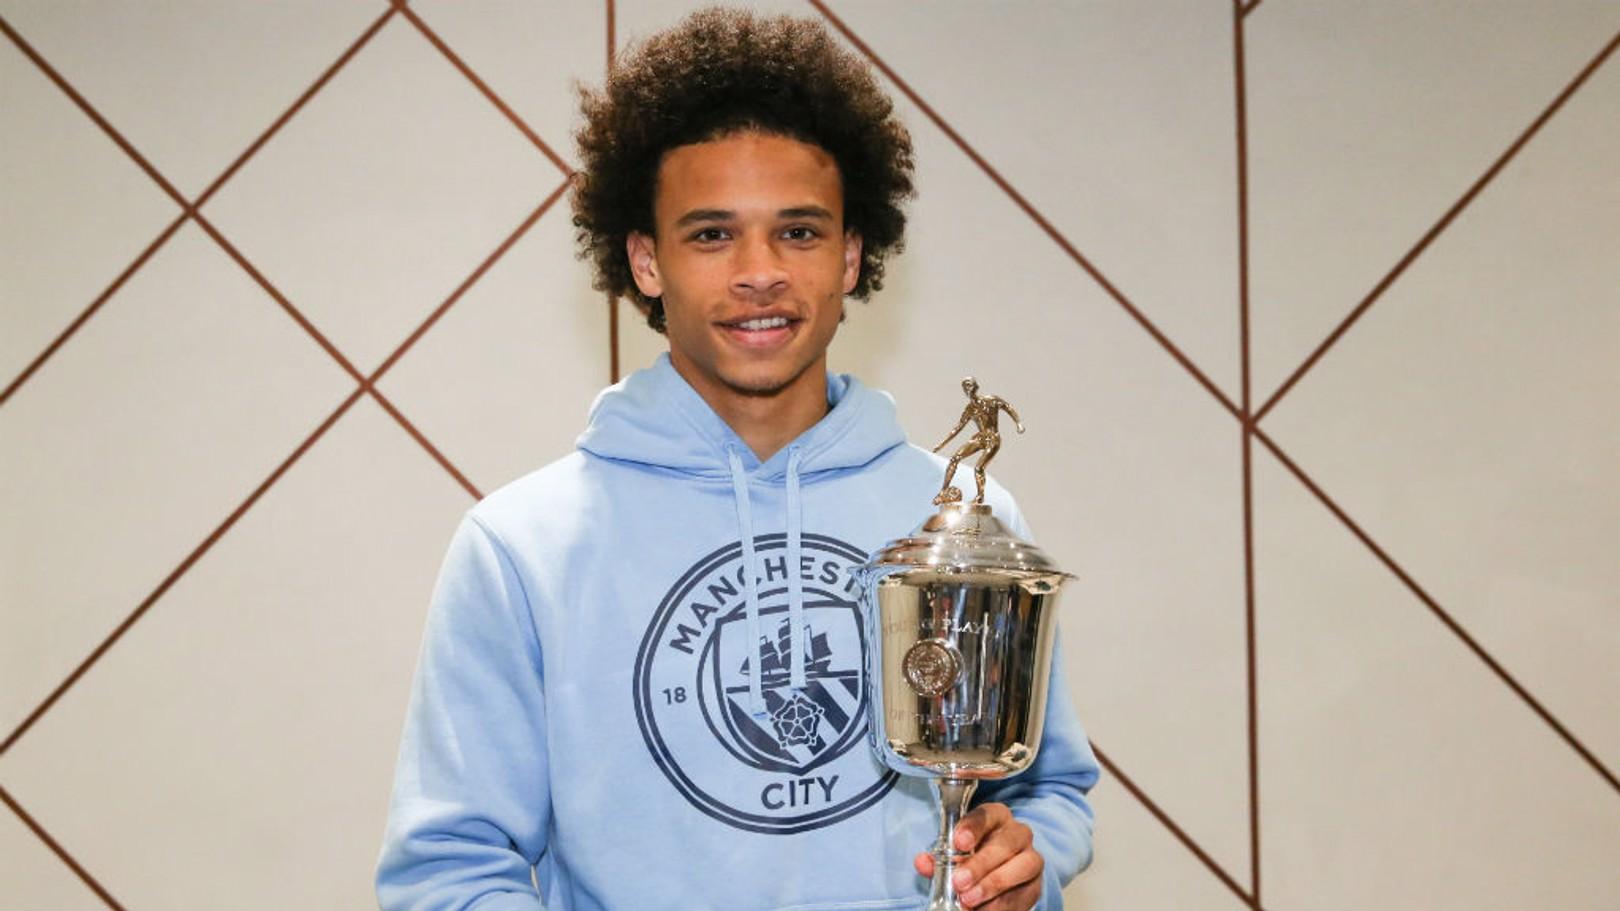 PRIZE GUY: Leroy Sane with his PFA award